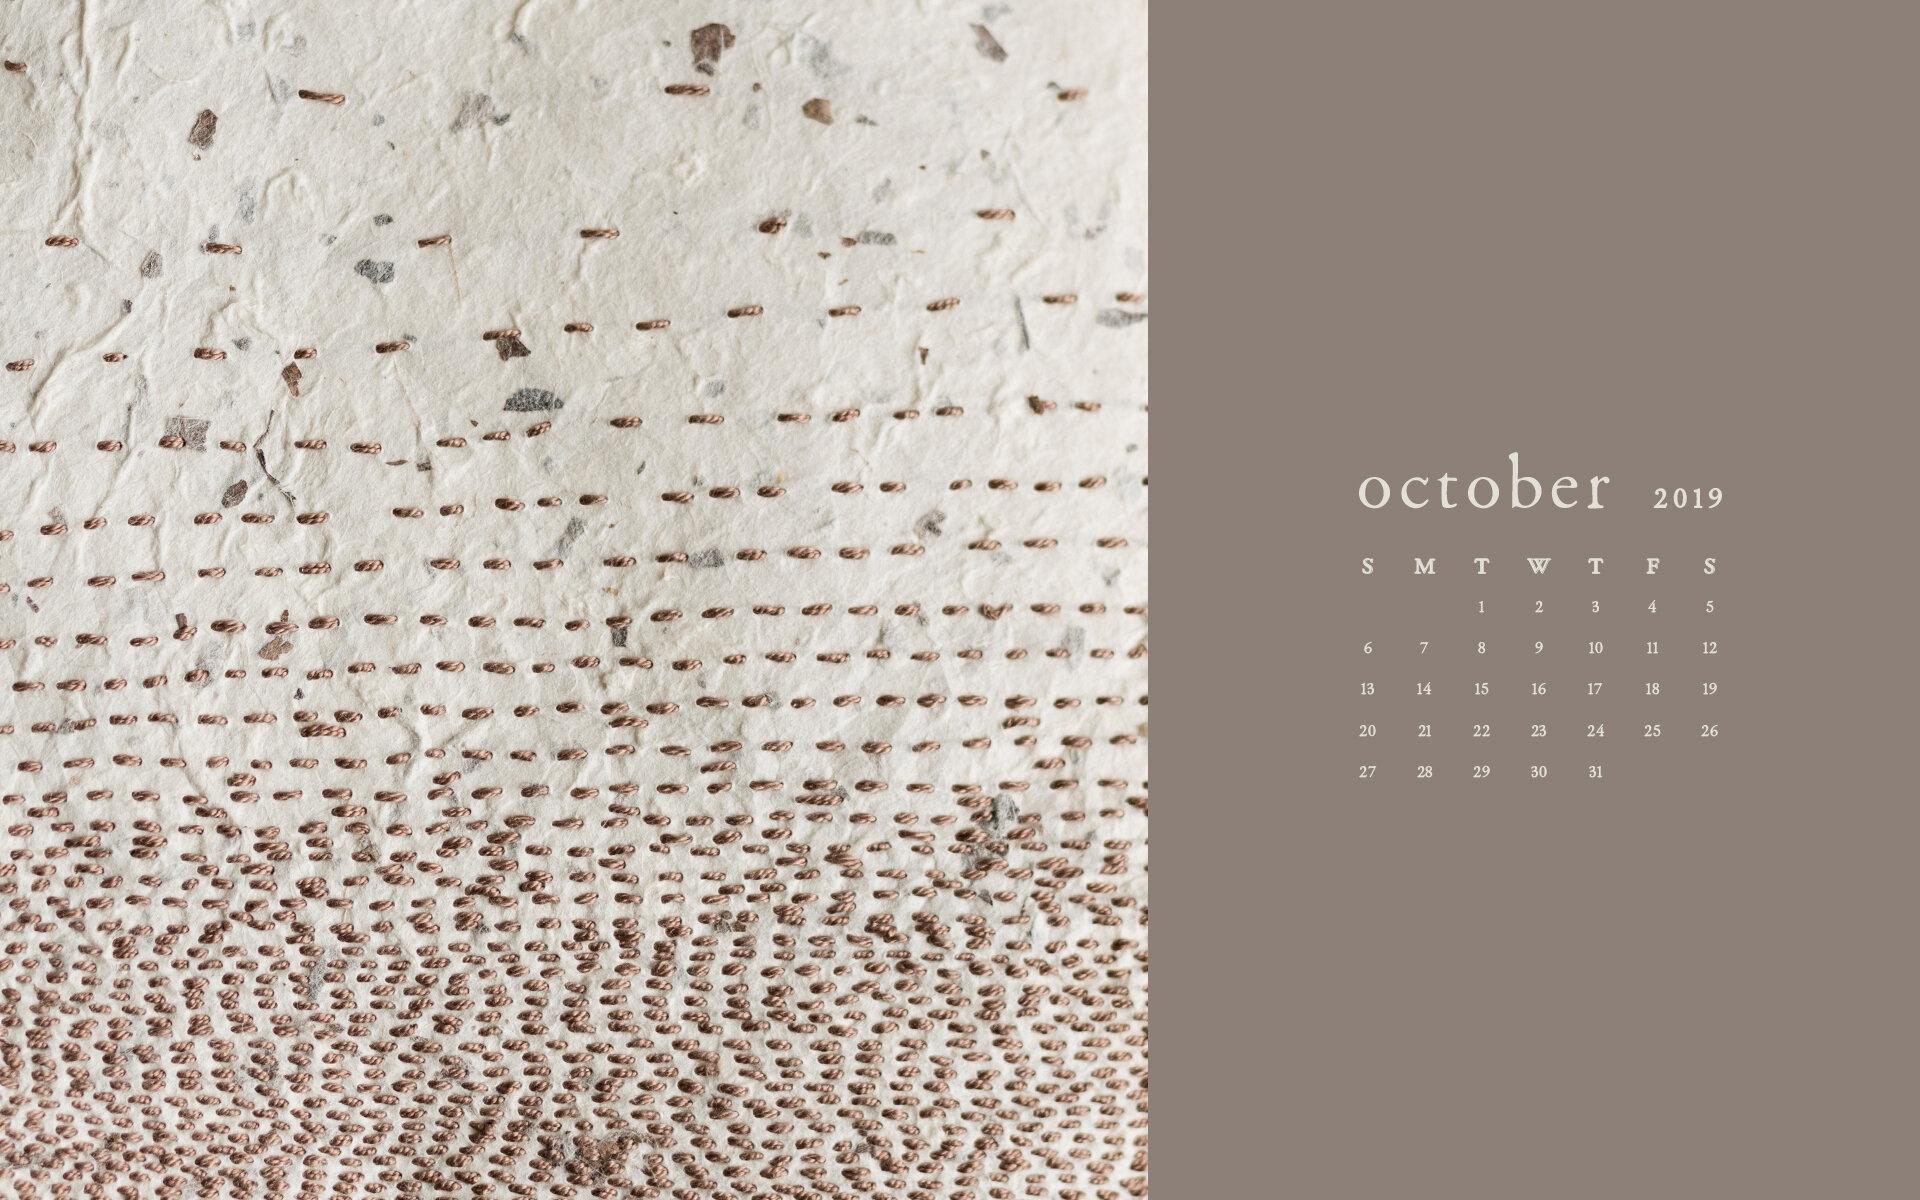 Wallpaper: October 2019 Calendar & Artwork | Computer | Britt Fabello